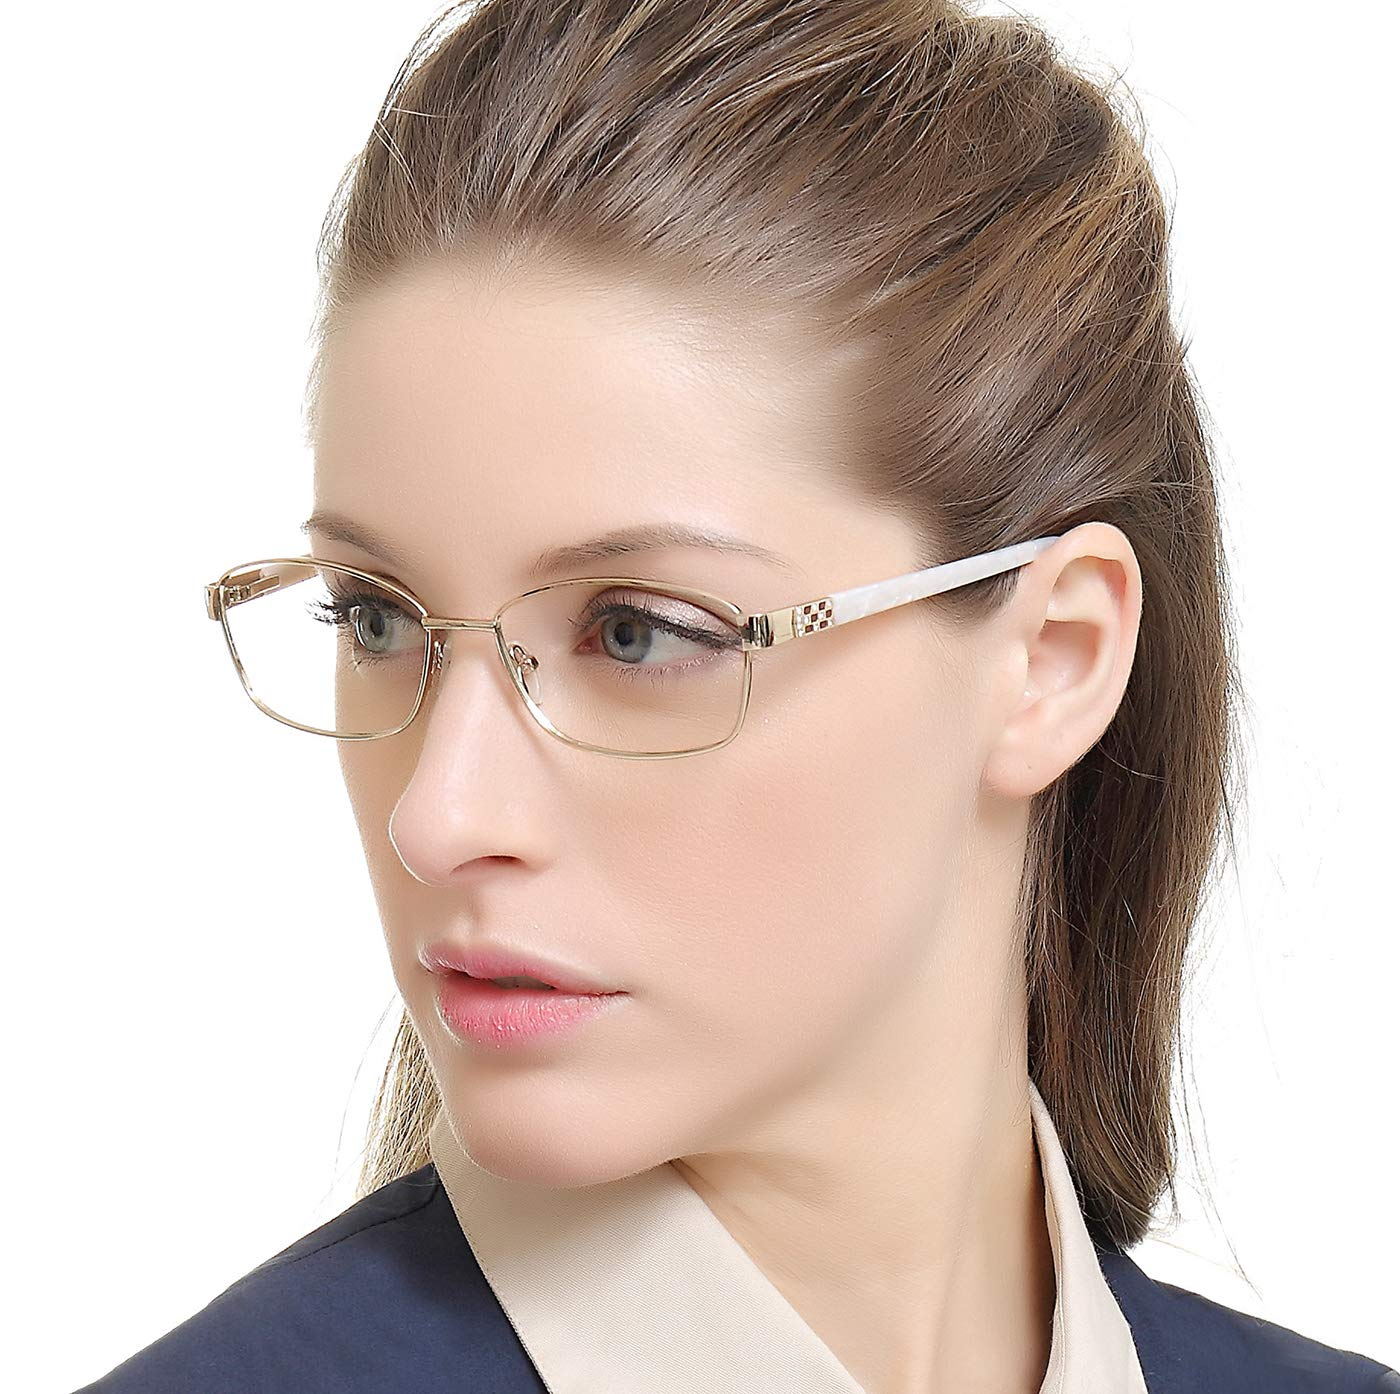 OCCI CHIARI Women Shining Rectangular Metal Optical Eyewear Frame with Clear Lenses (Cream White,55)